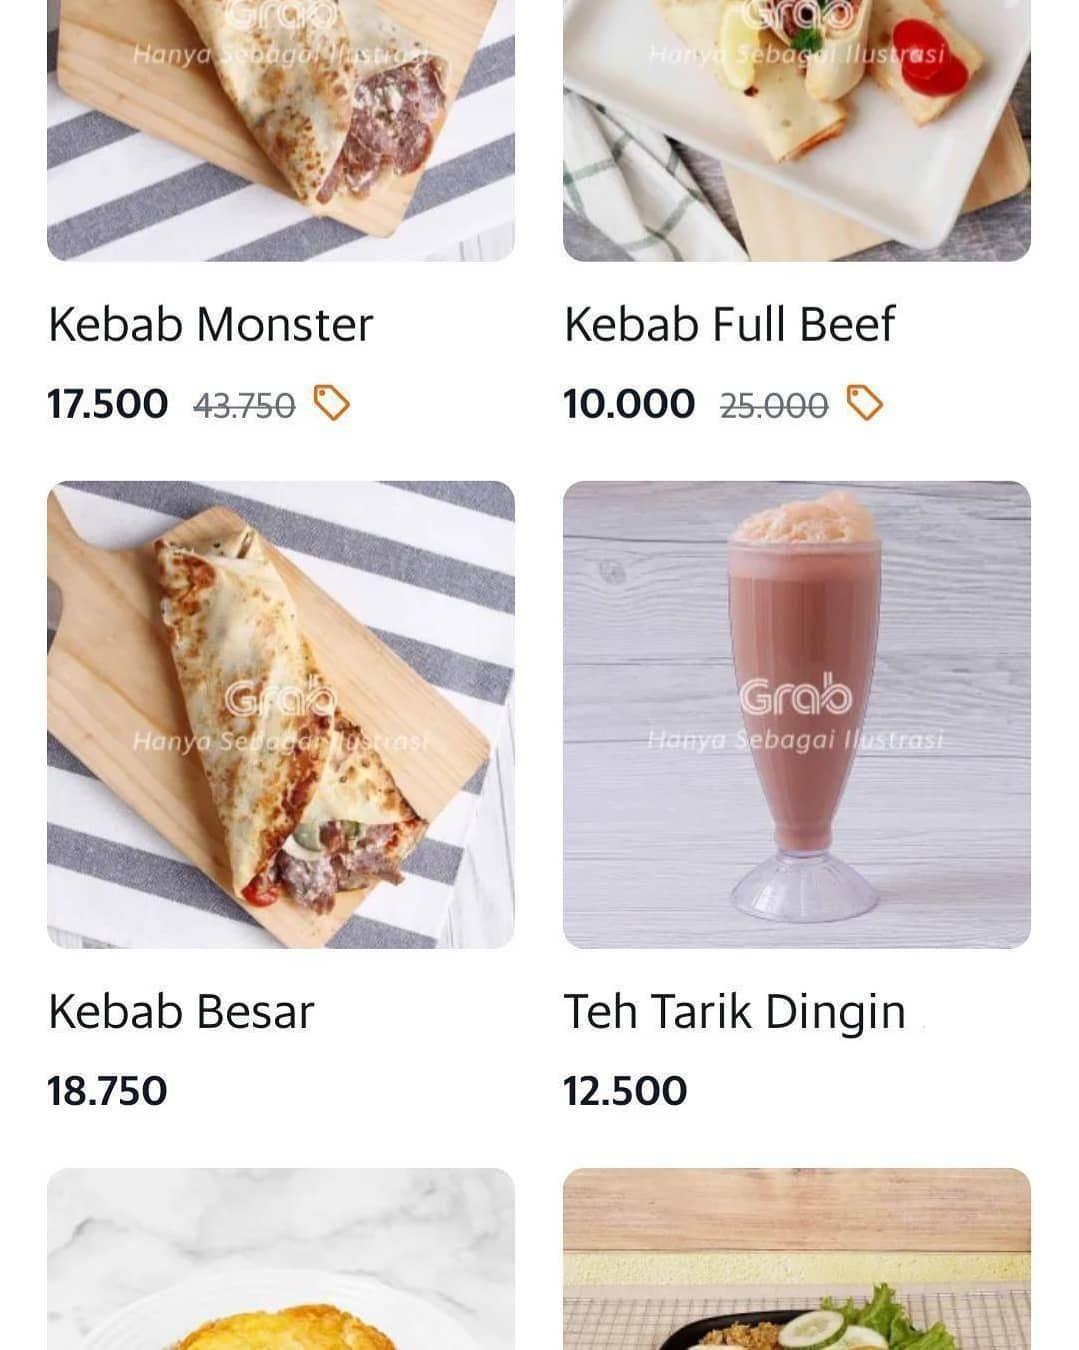 Bikin Kesal! Wanita Ini Pesan Kebab Monster yang Datang Kebab Isi Daging Tipis